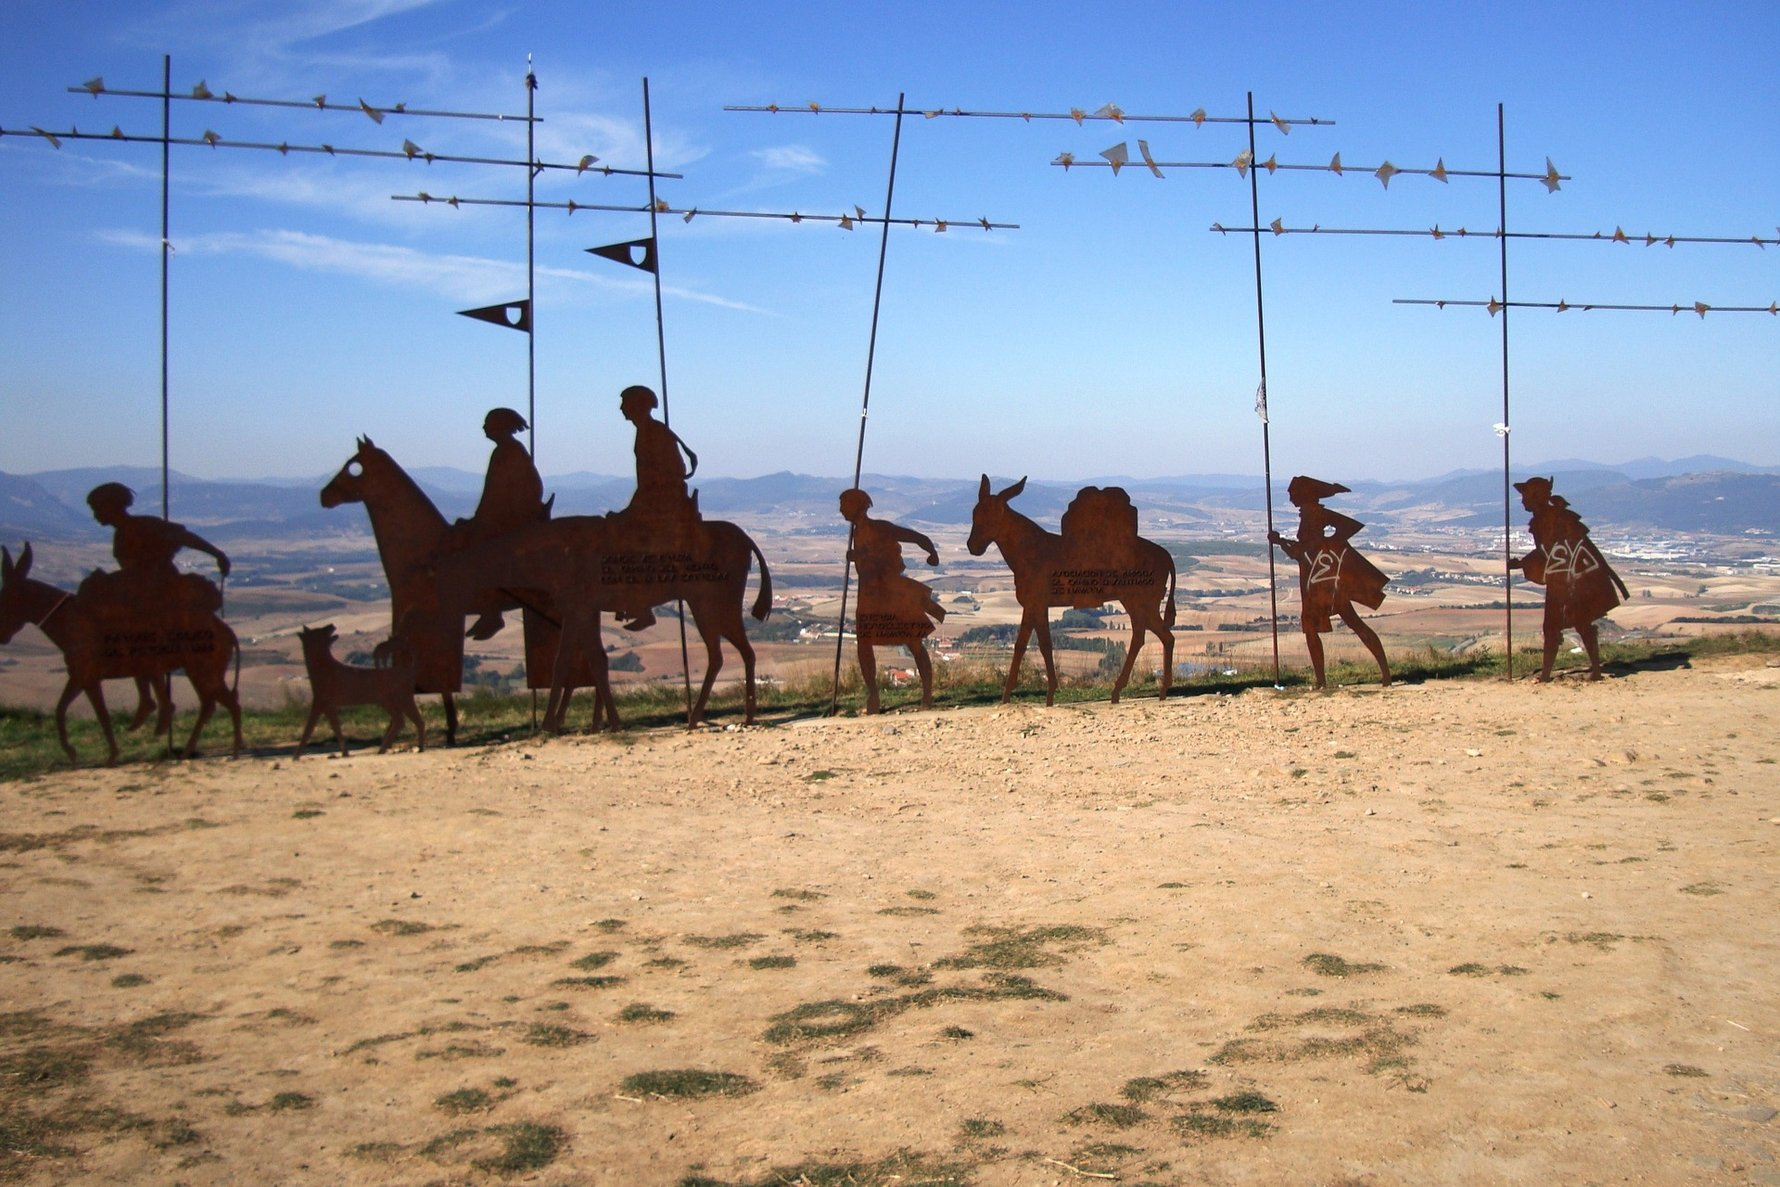 Santiago de Compostela © ailabrocker0 from Pixabay